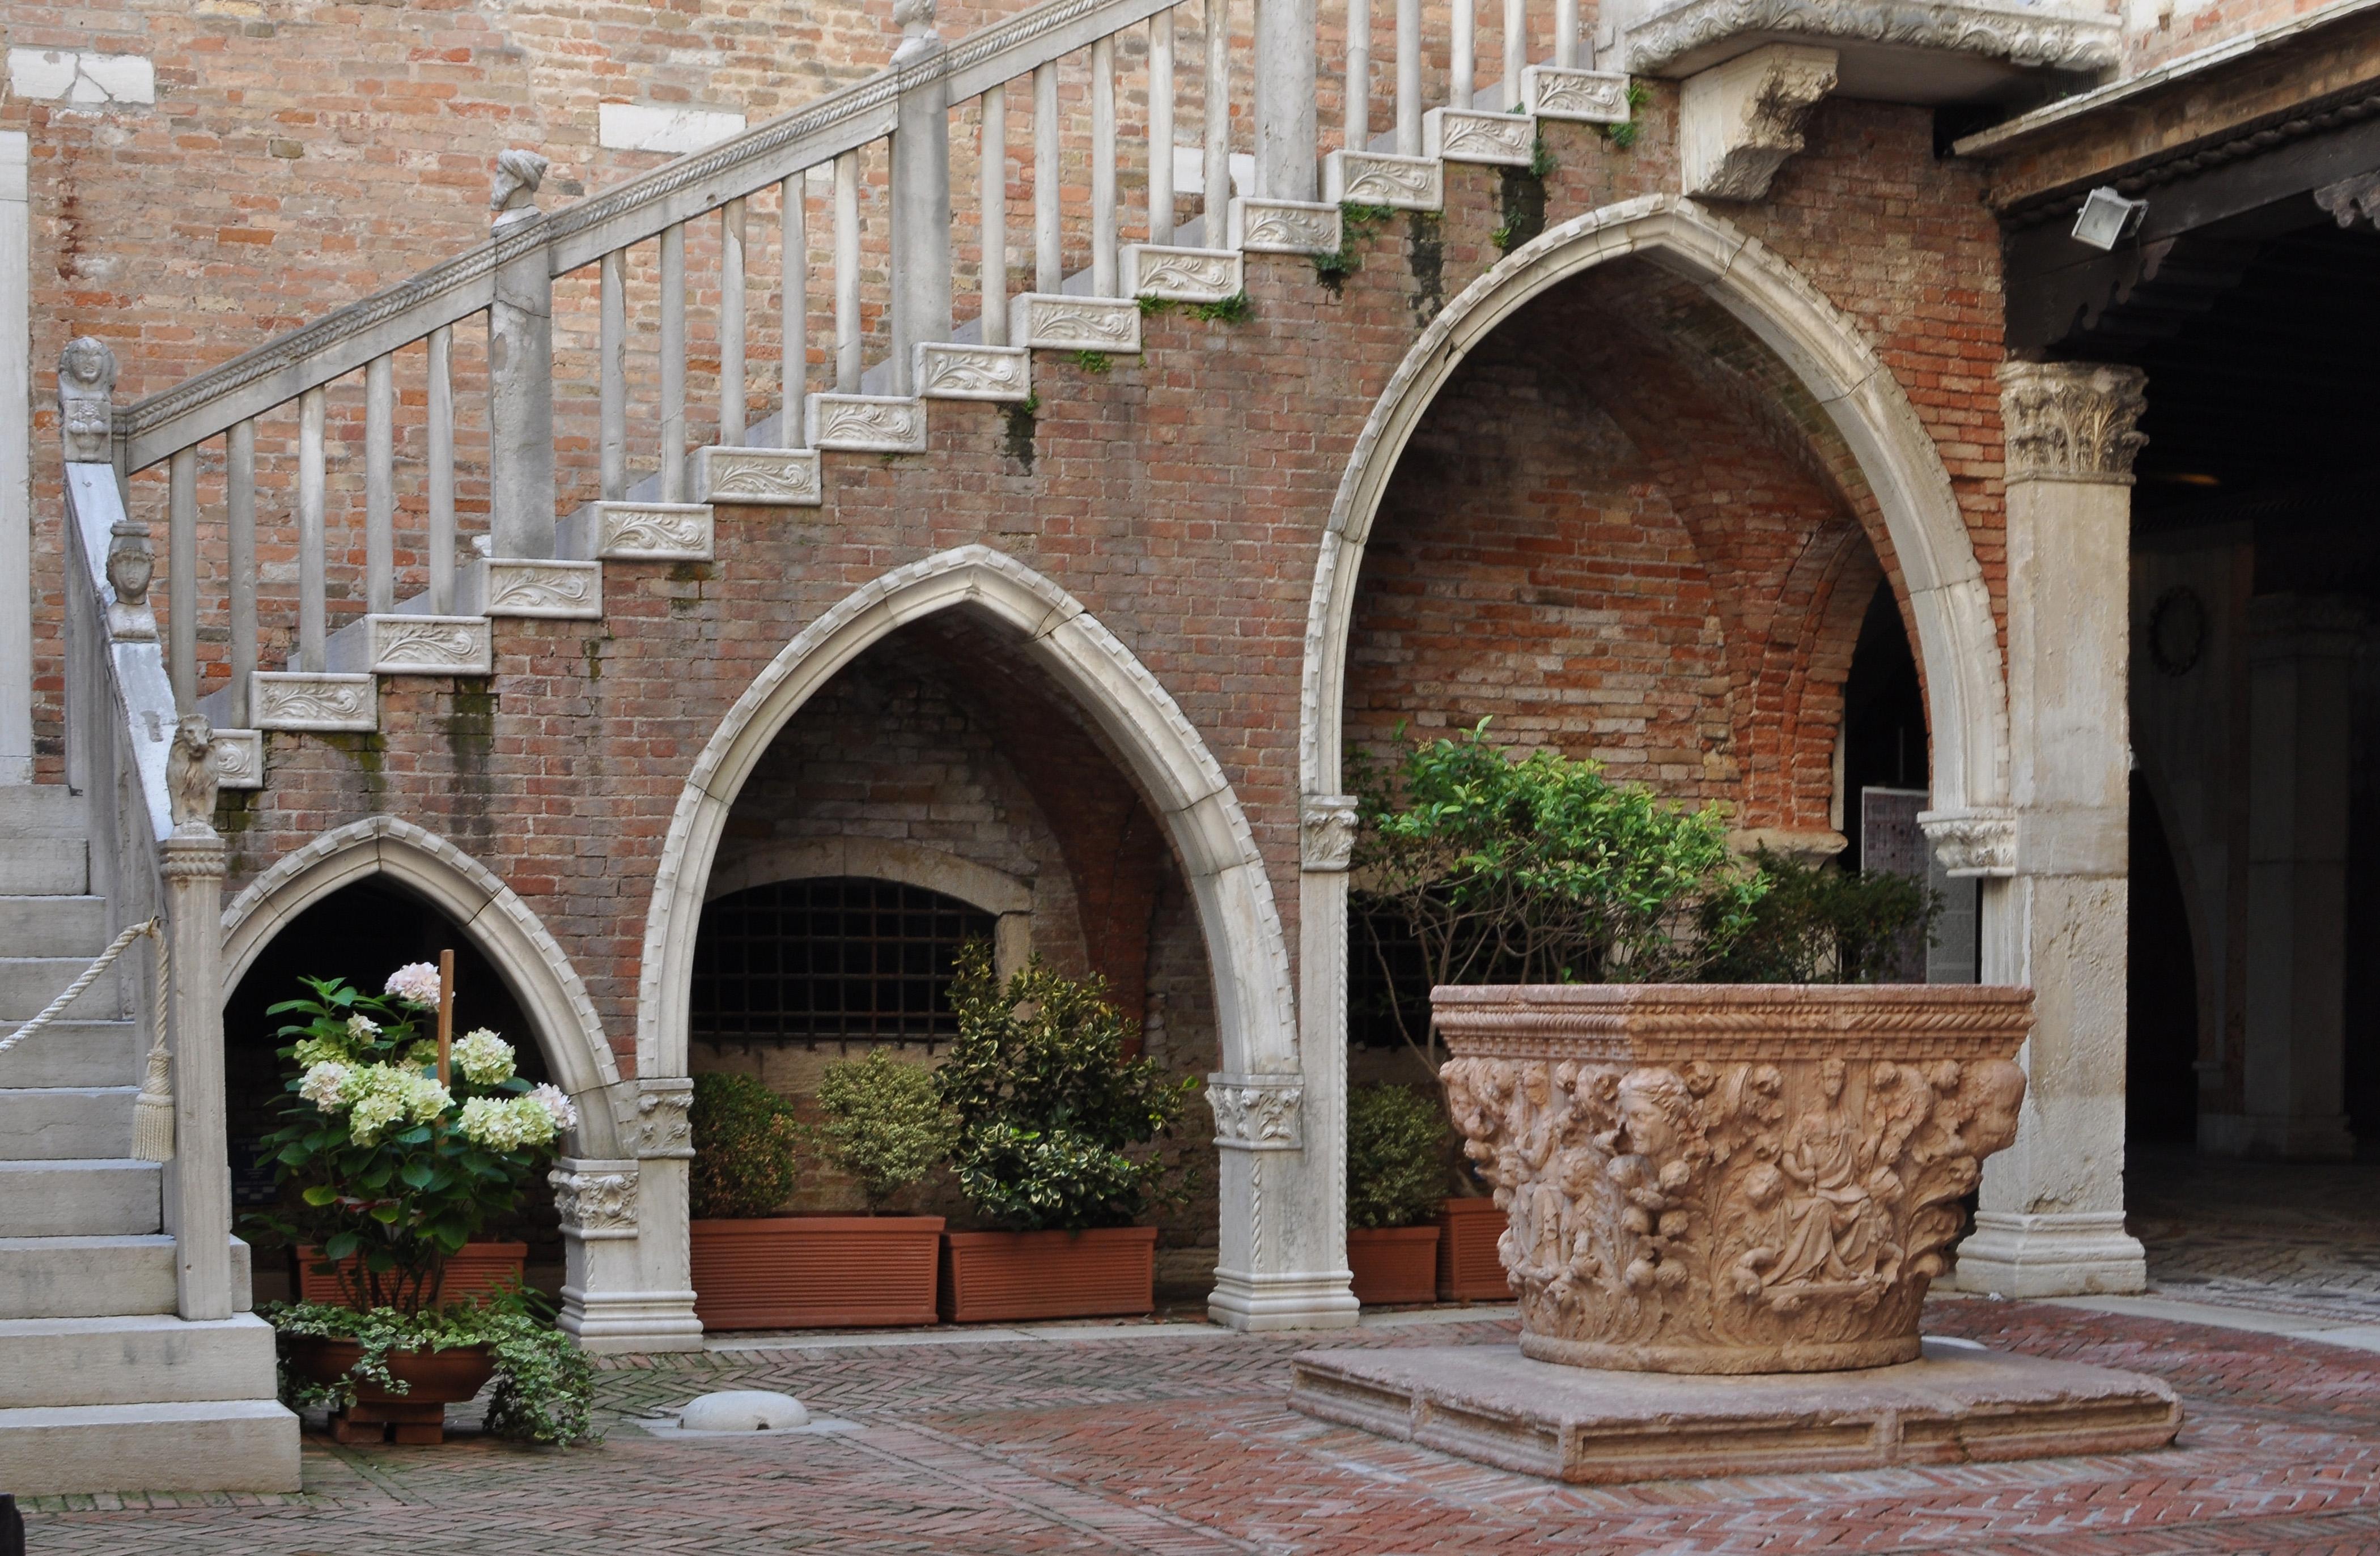 File Courtyard Of Ca D Oro Venice 005 Jpg Wikimedia Commons